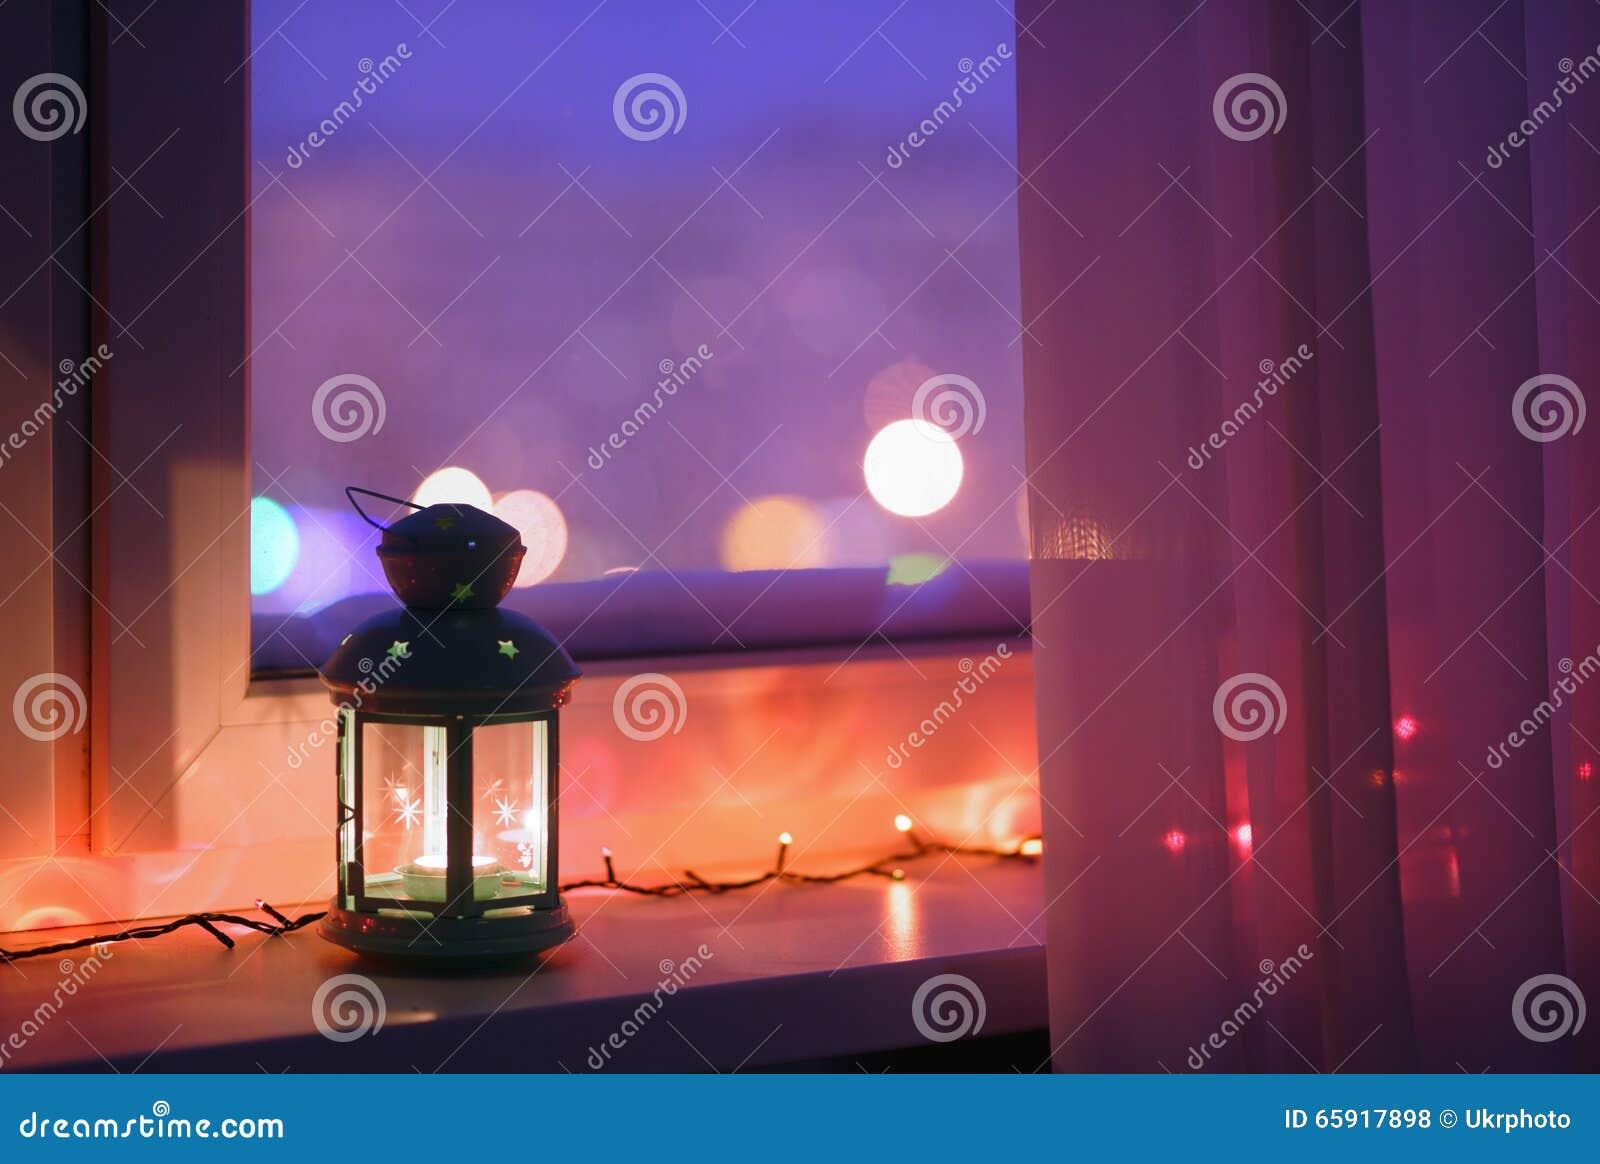 Lantern on a window sill stock photo image 65917898 - Christmas window sill lights ...